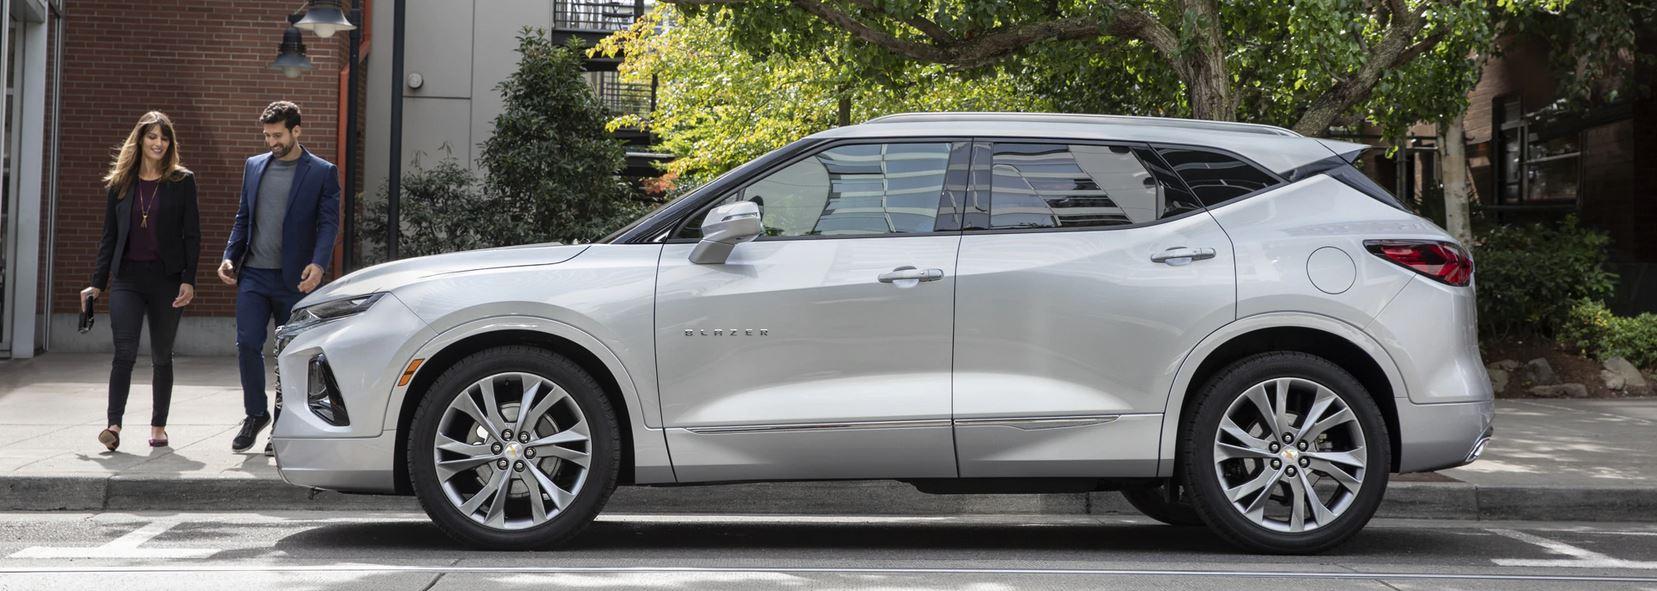 2020 Chevrolet Blazer Leasing near Southfield, MI